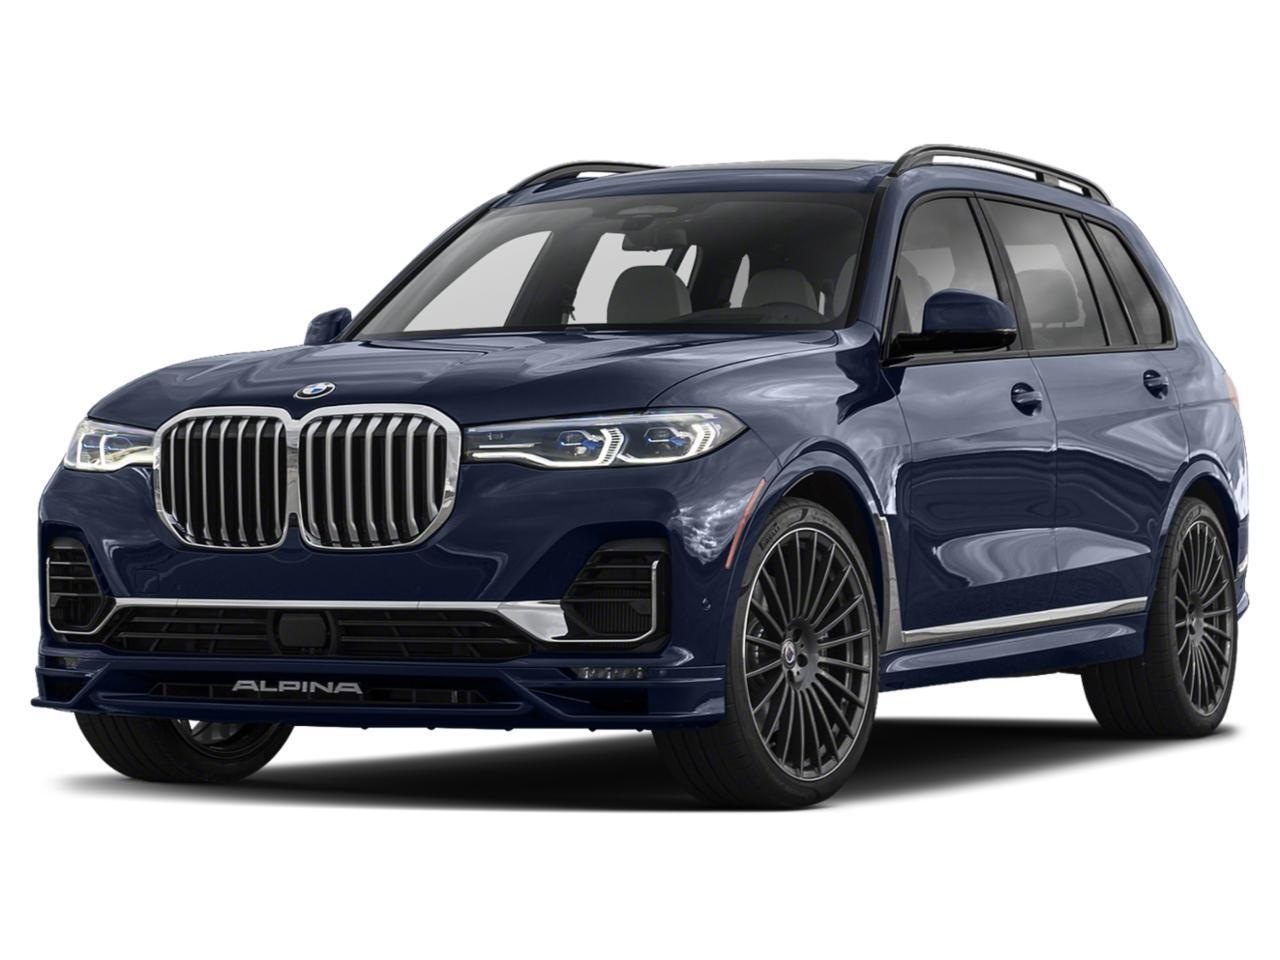 2021 BMW X7 ALPINA XB7 Vehicle Photo in Grapevine, TX 76051